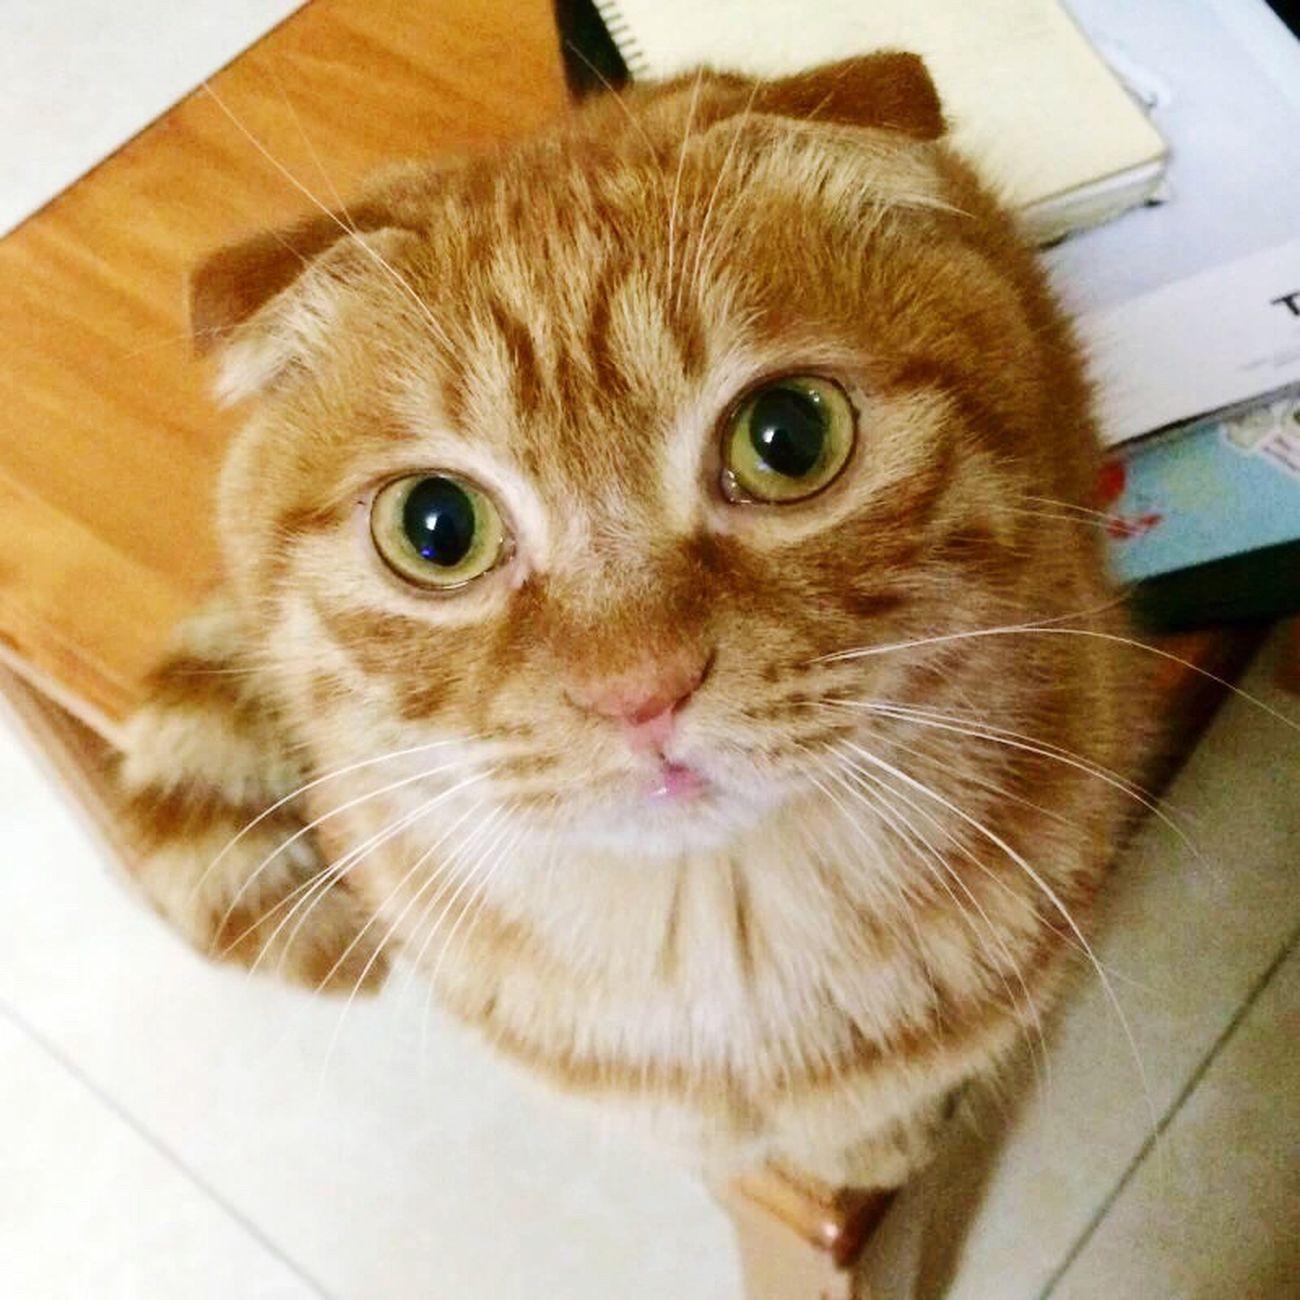 Cat Catlover Ilovecat Pets Furball Fluffy Selfie ✌ Gingercat Eyes hi I'm Macchiato..